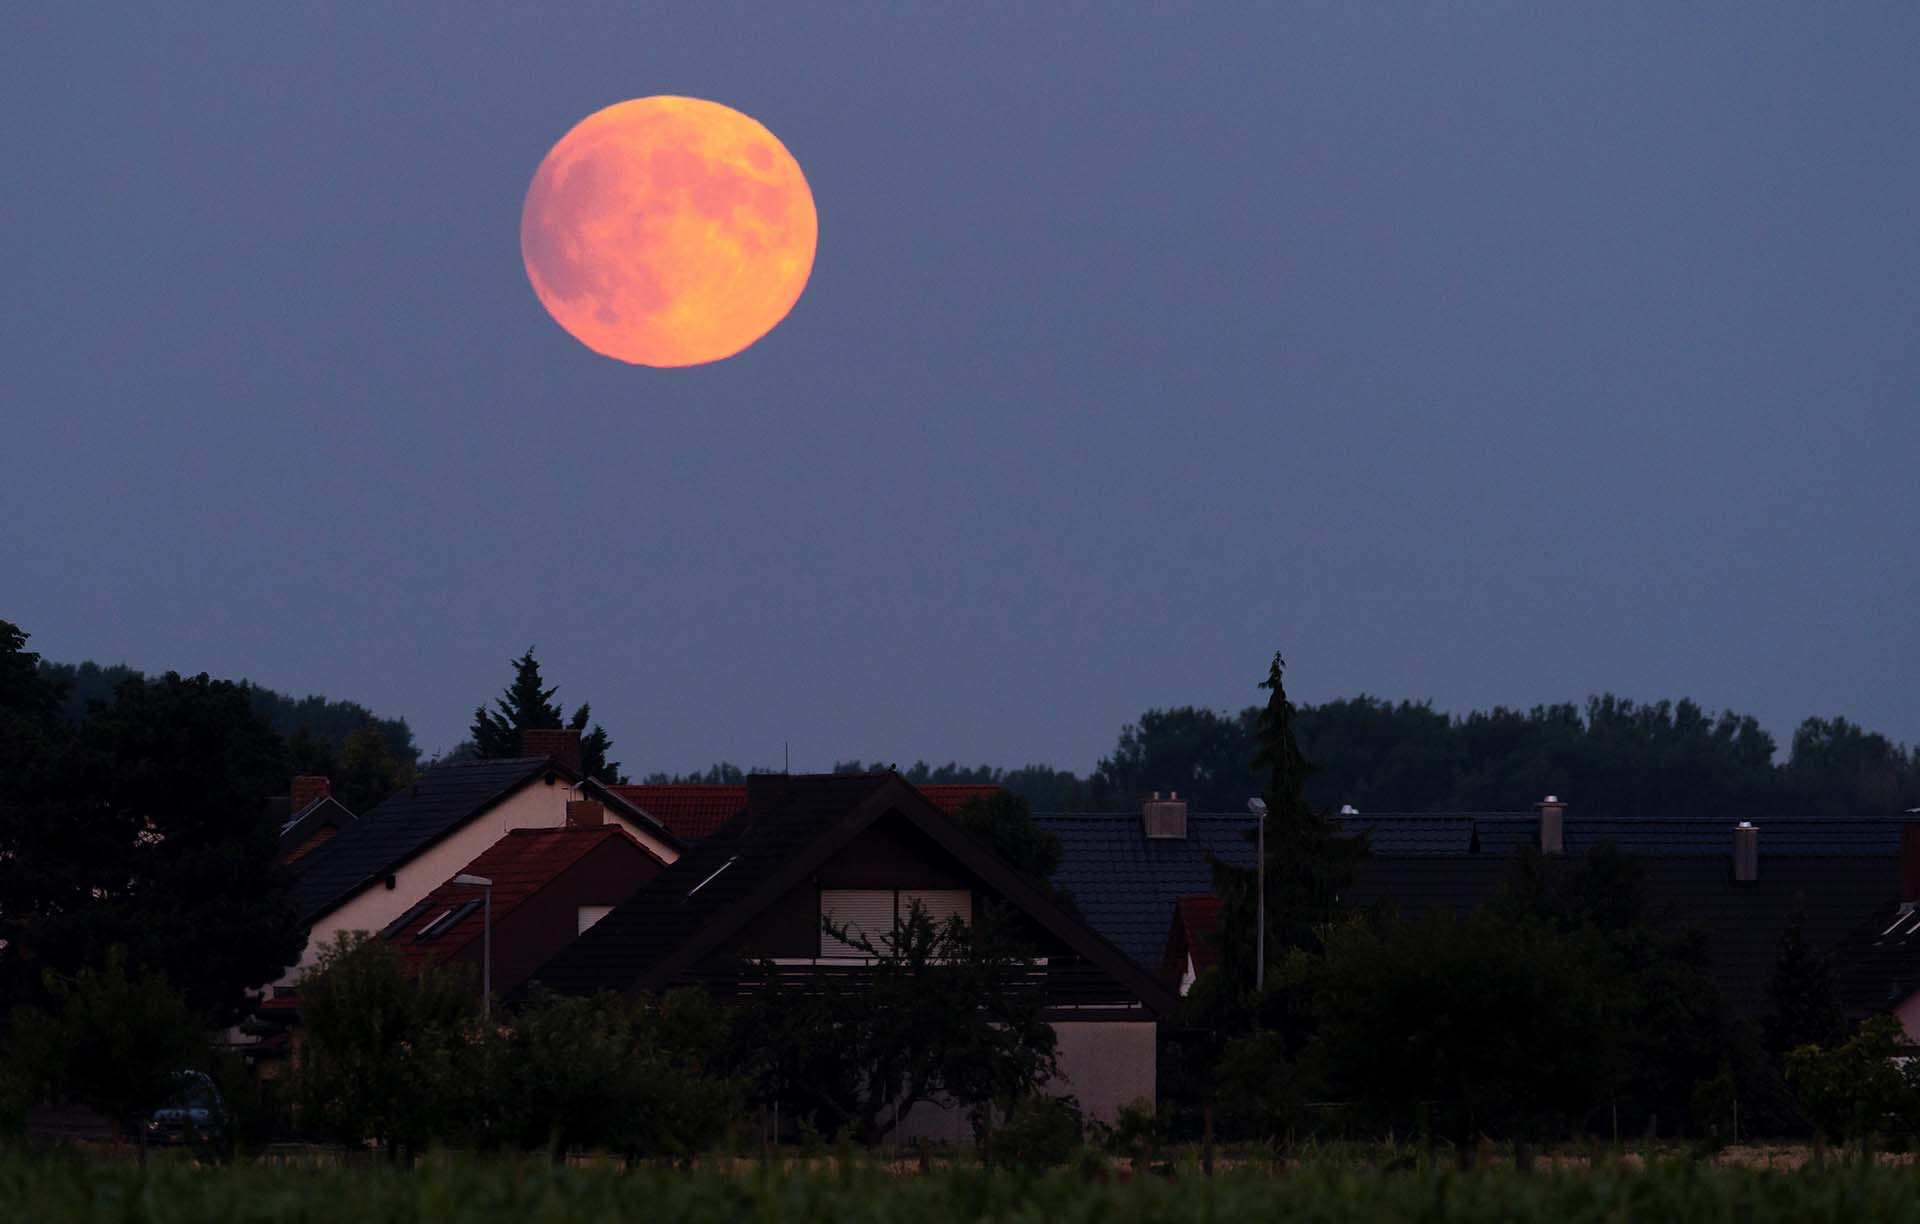 Speyer, Alemania (EFE/EPA/RONALD WITTEK)